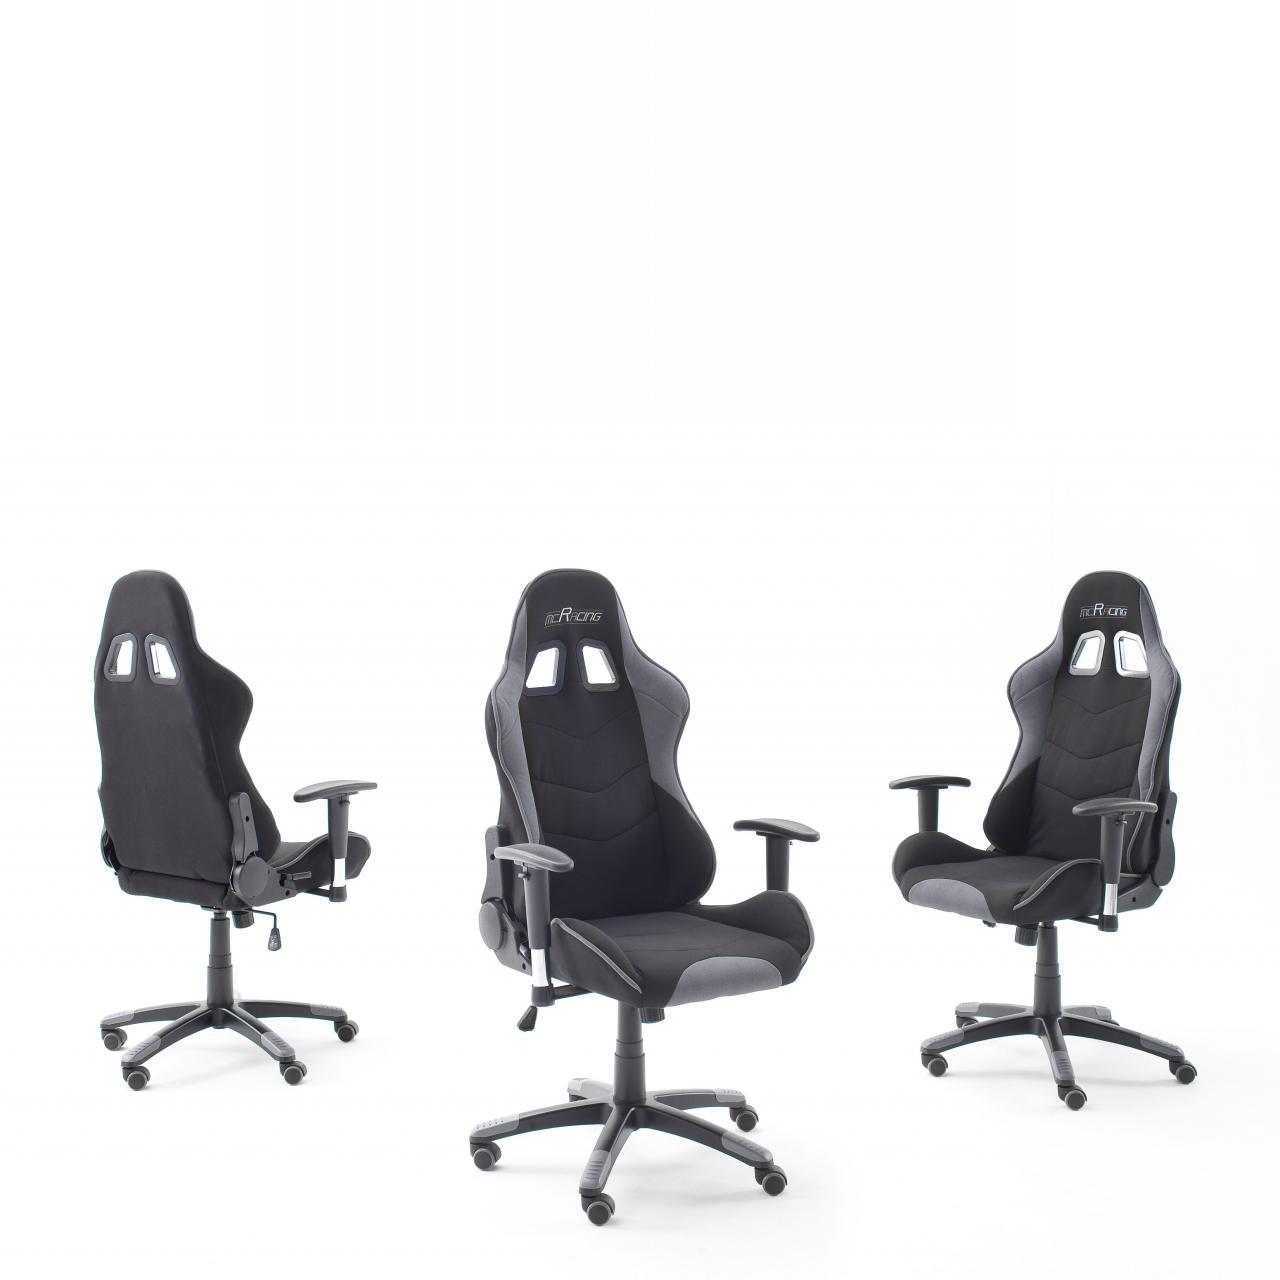 Gamingstuhl mcRacing 2 Grau Schwarz Gaslift Polyester Bürostuhl Drehstuhl Büro Stuhl